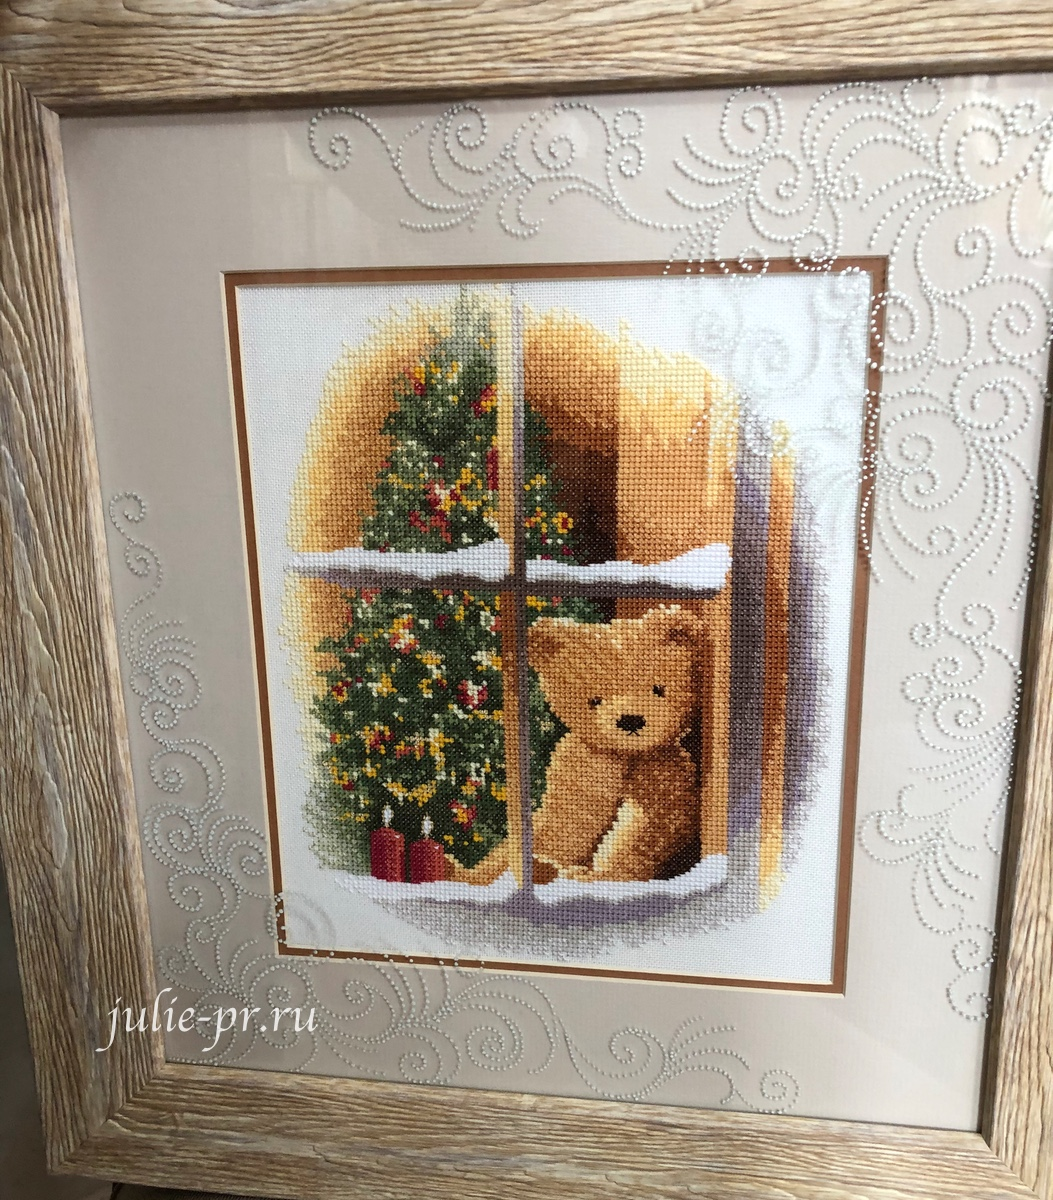 William At Christmas Teddy Bear, Вильям на Рождество, вышивка крестом, Heritage, John Clayton, выставка Грани Джона Клейтона